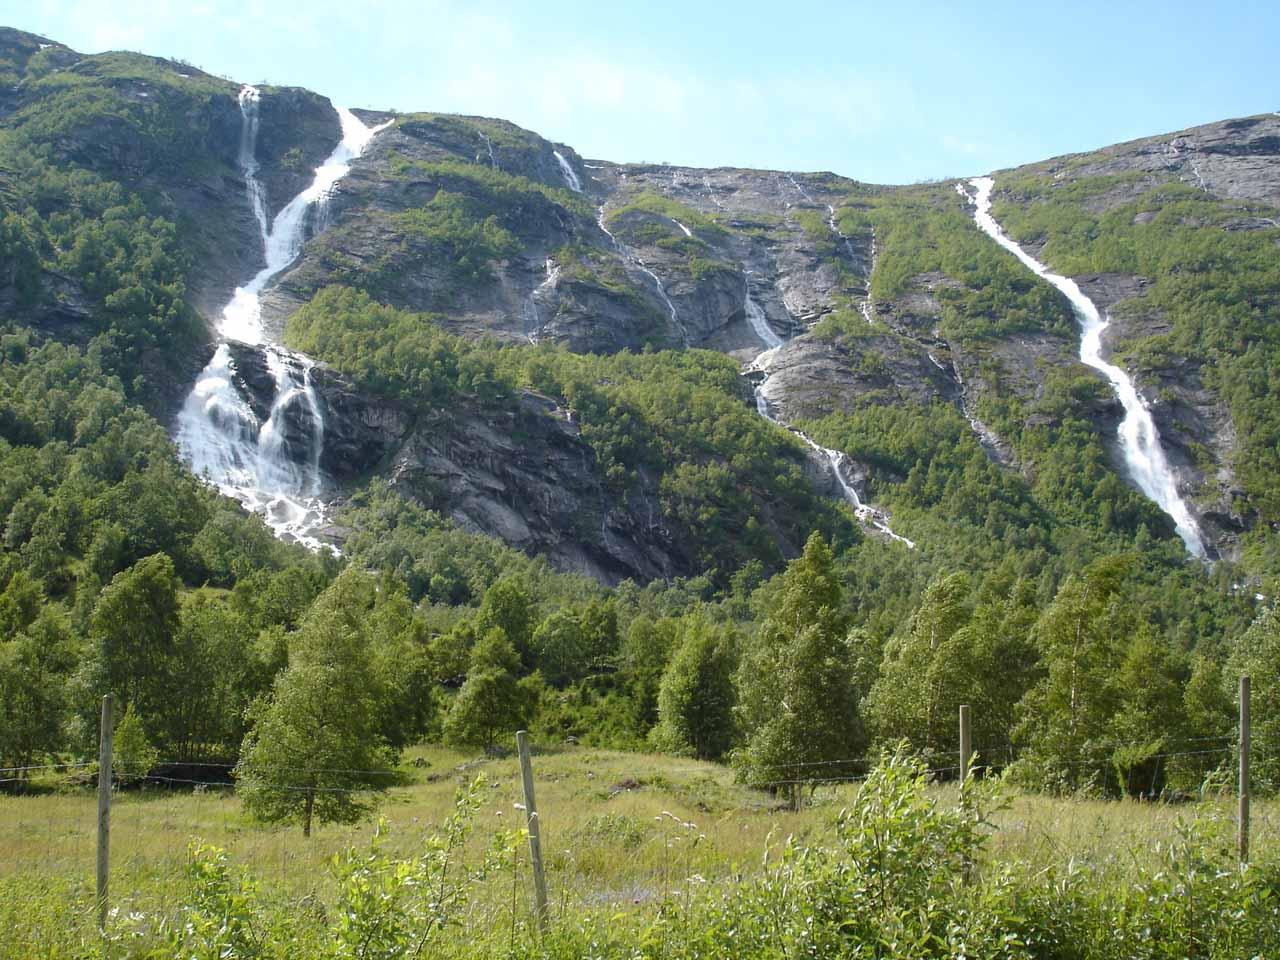 Impressive pair of waterfalls on the Tverrgrova and Høvla watercourses